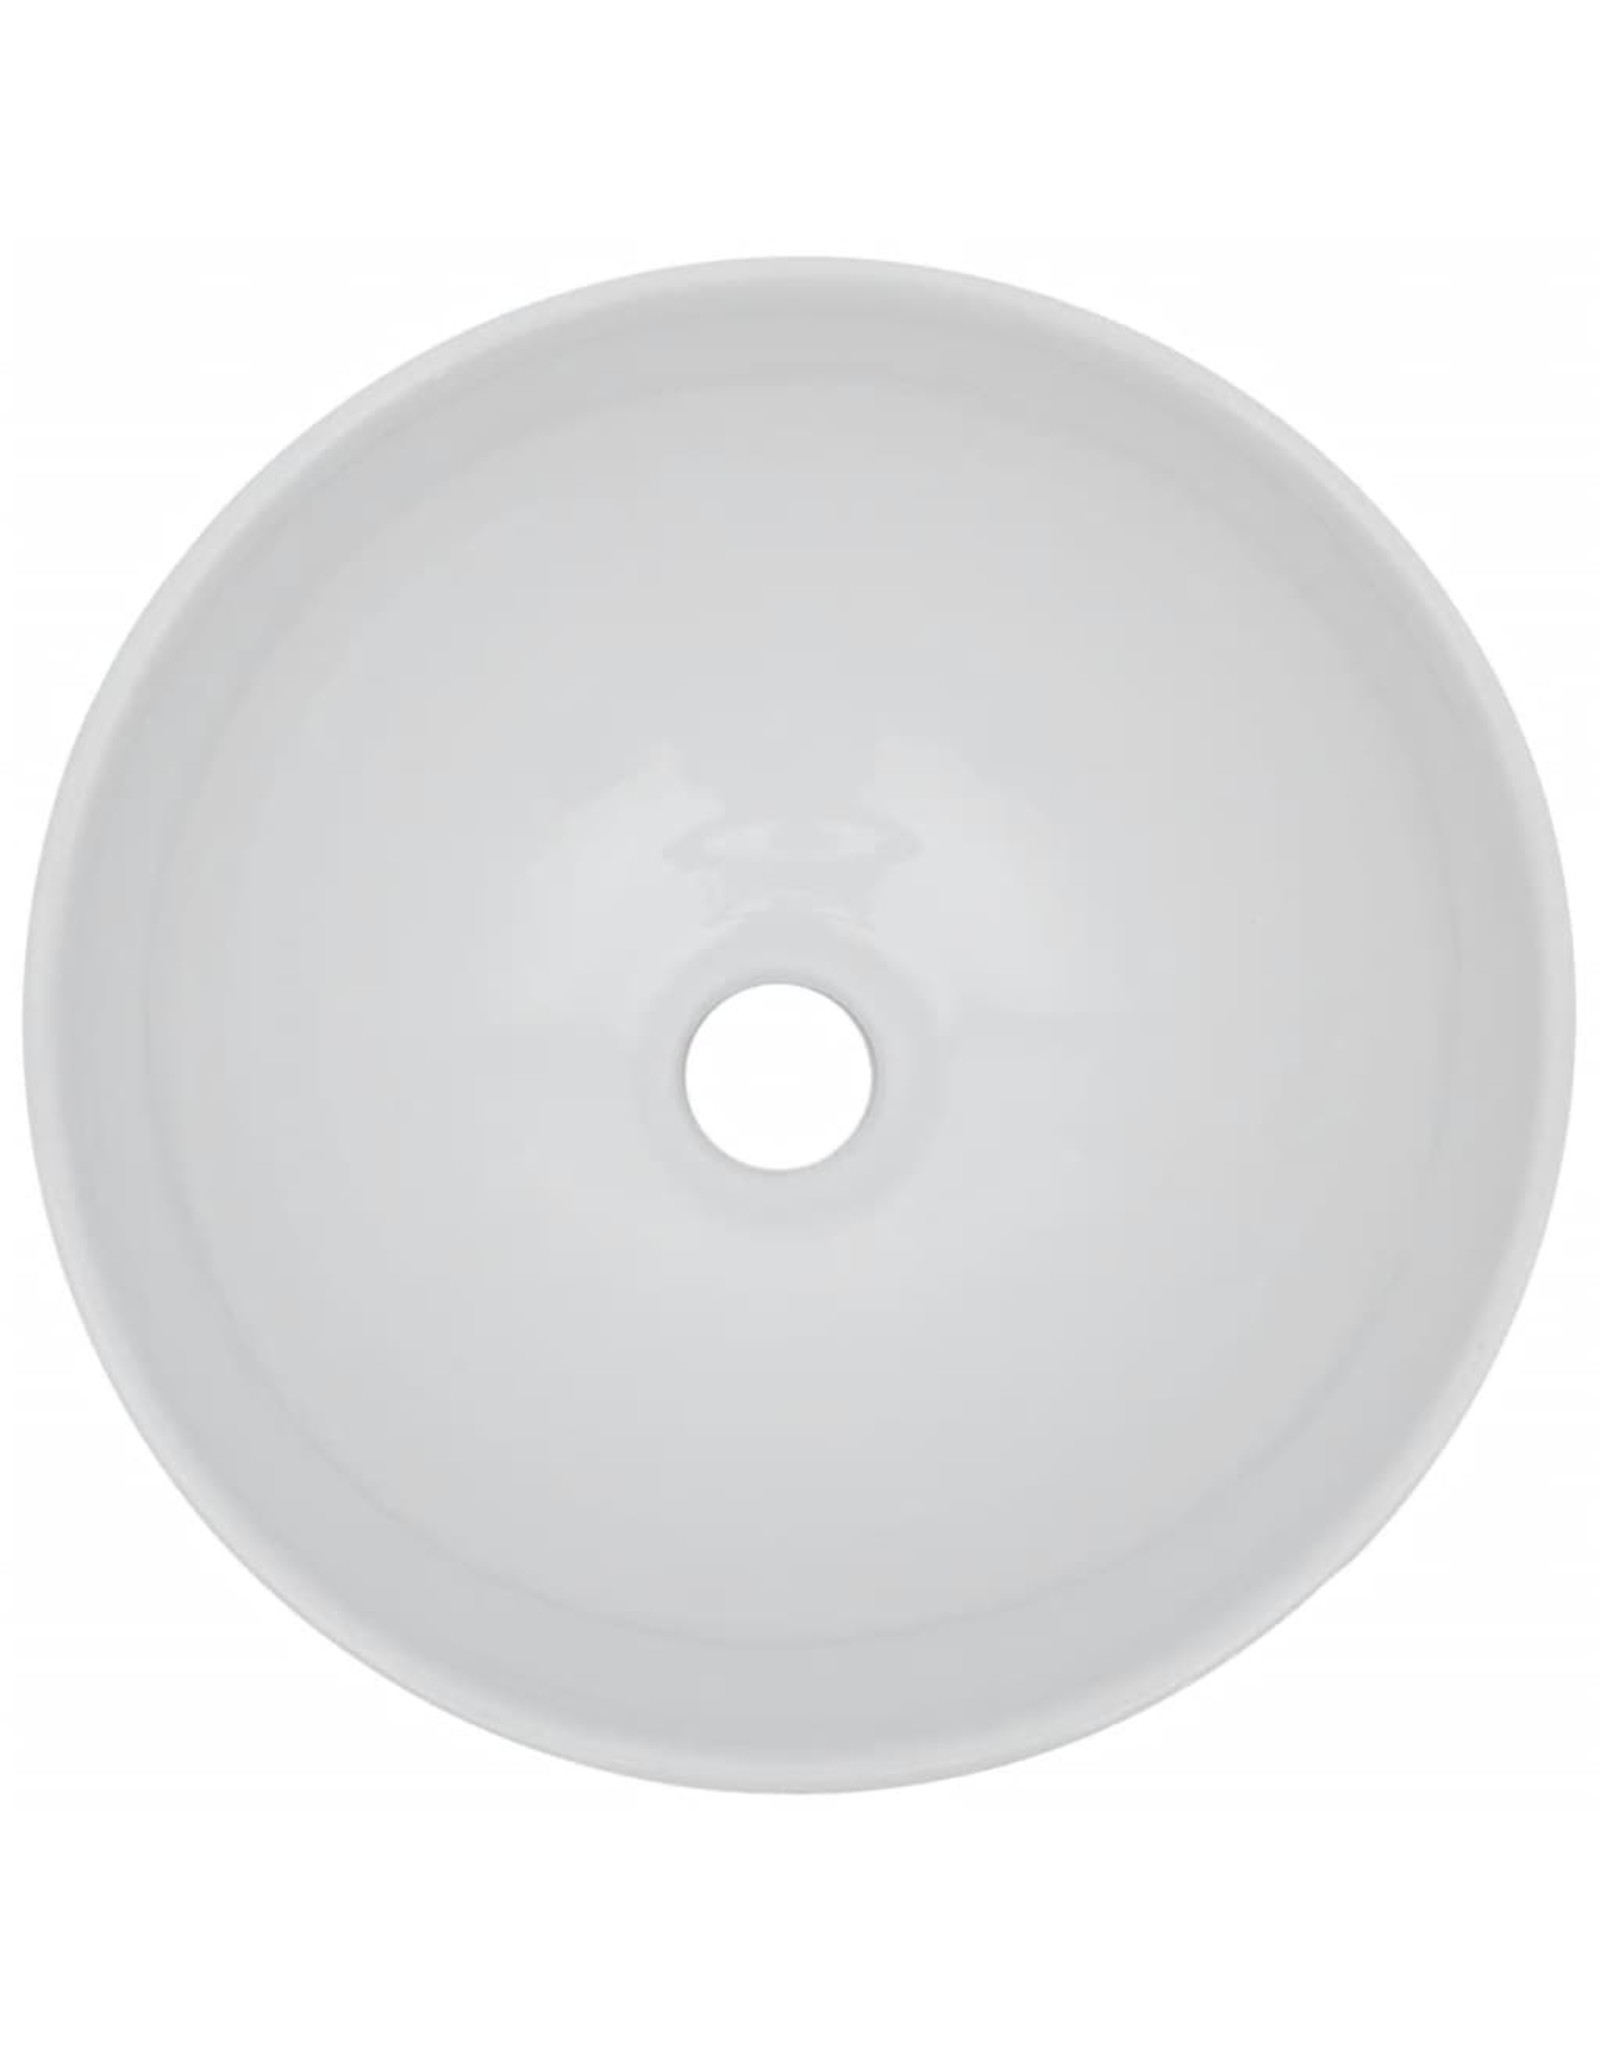 3-delige Badkamermeubelset keramiek wit